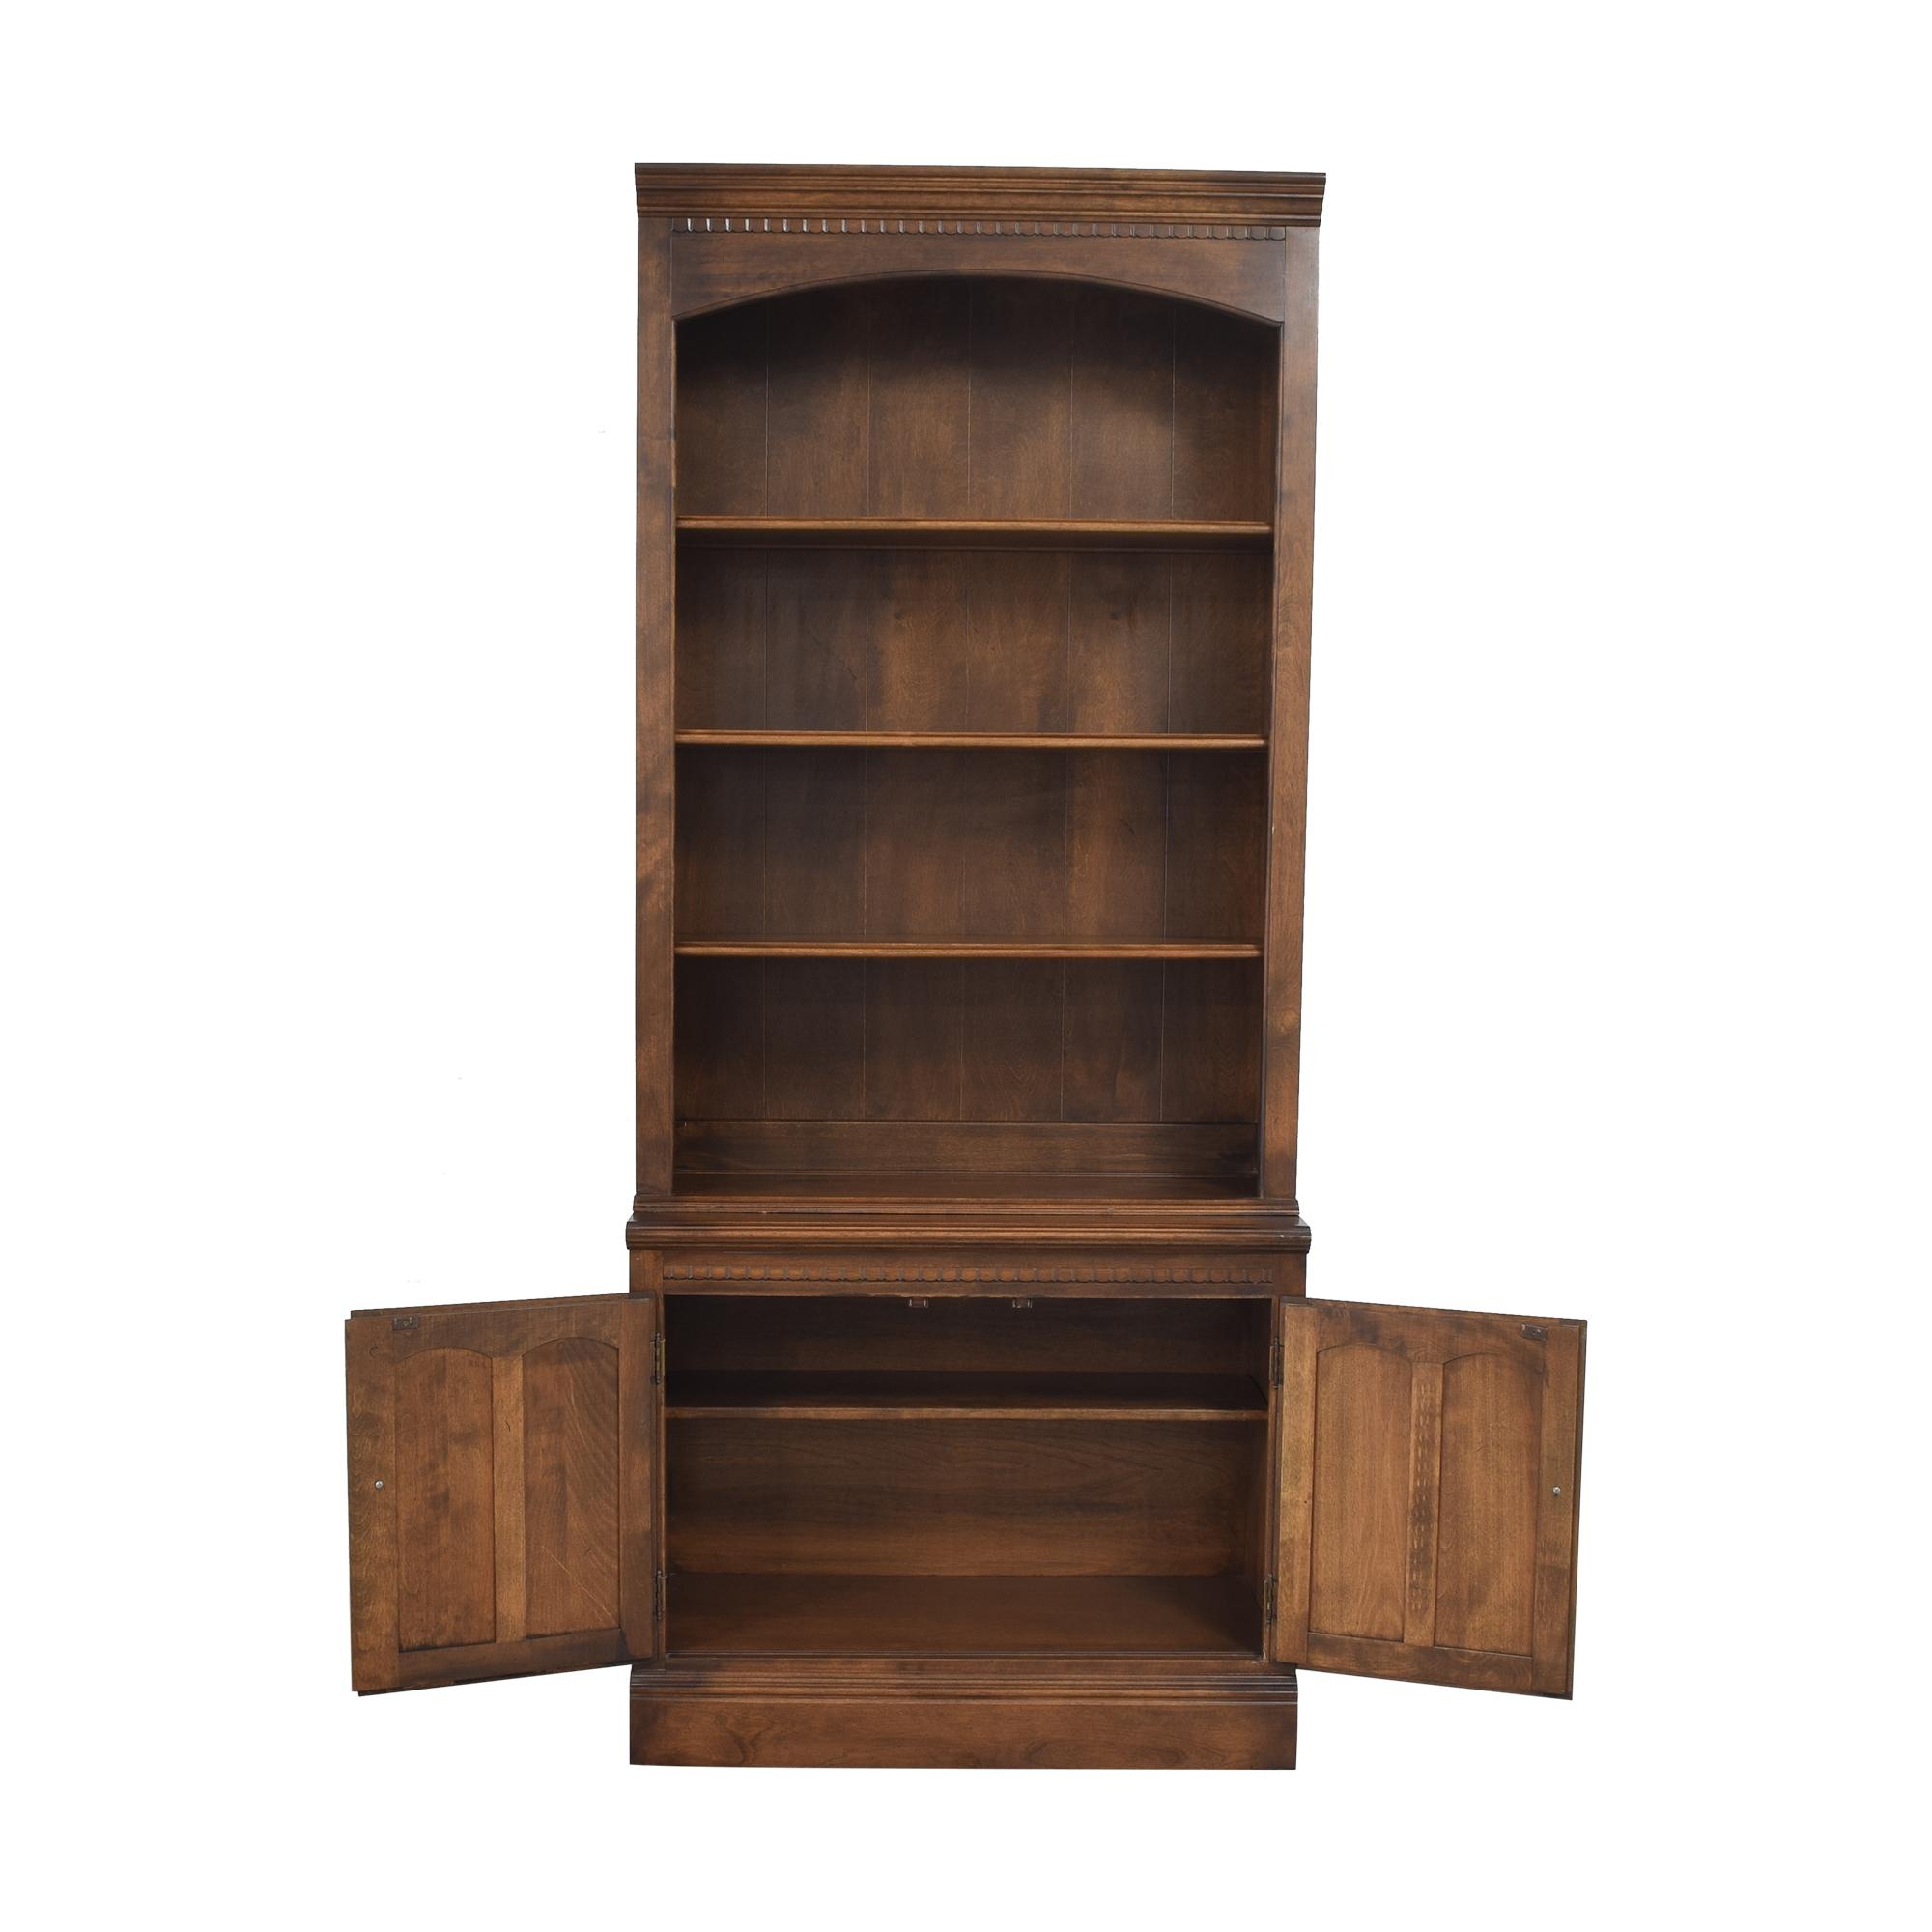 buy Ethan Allen Classic Manor Bookcase Ethan Allen Bookcases & Shelving